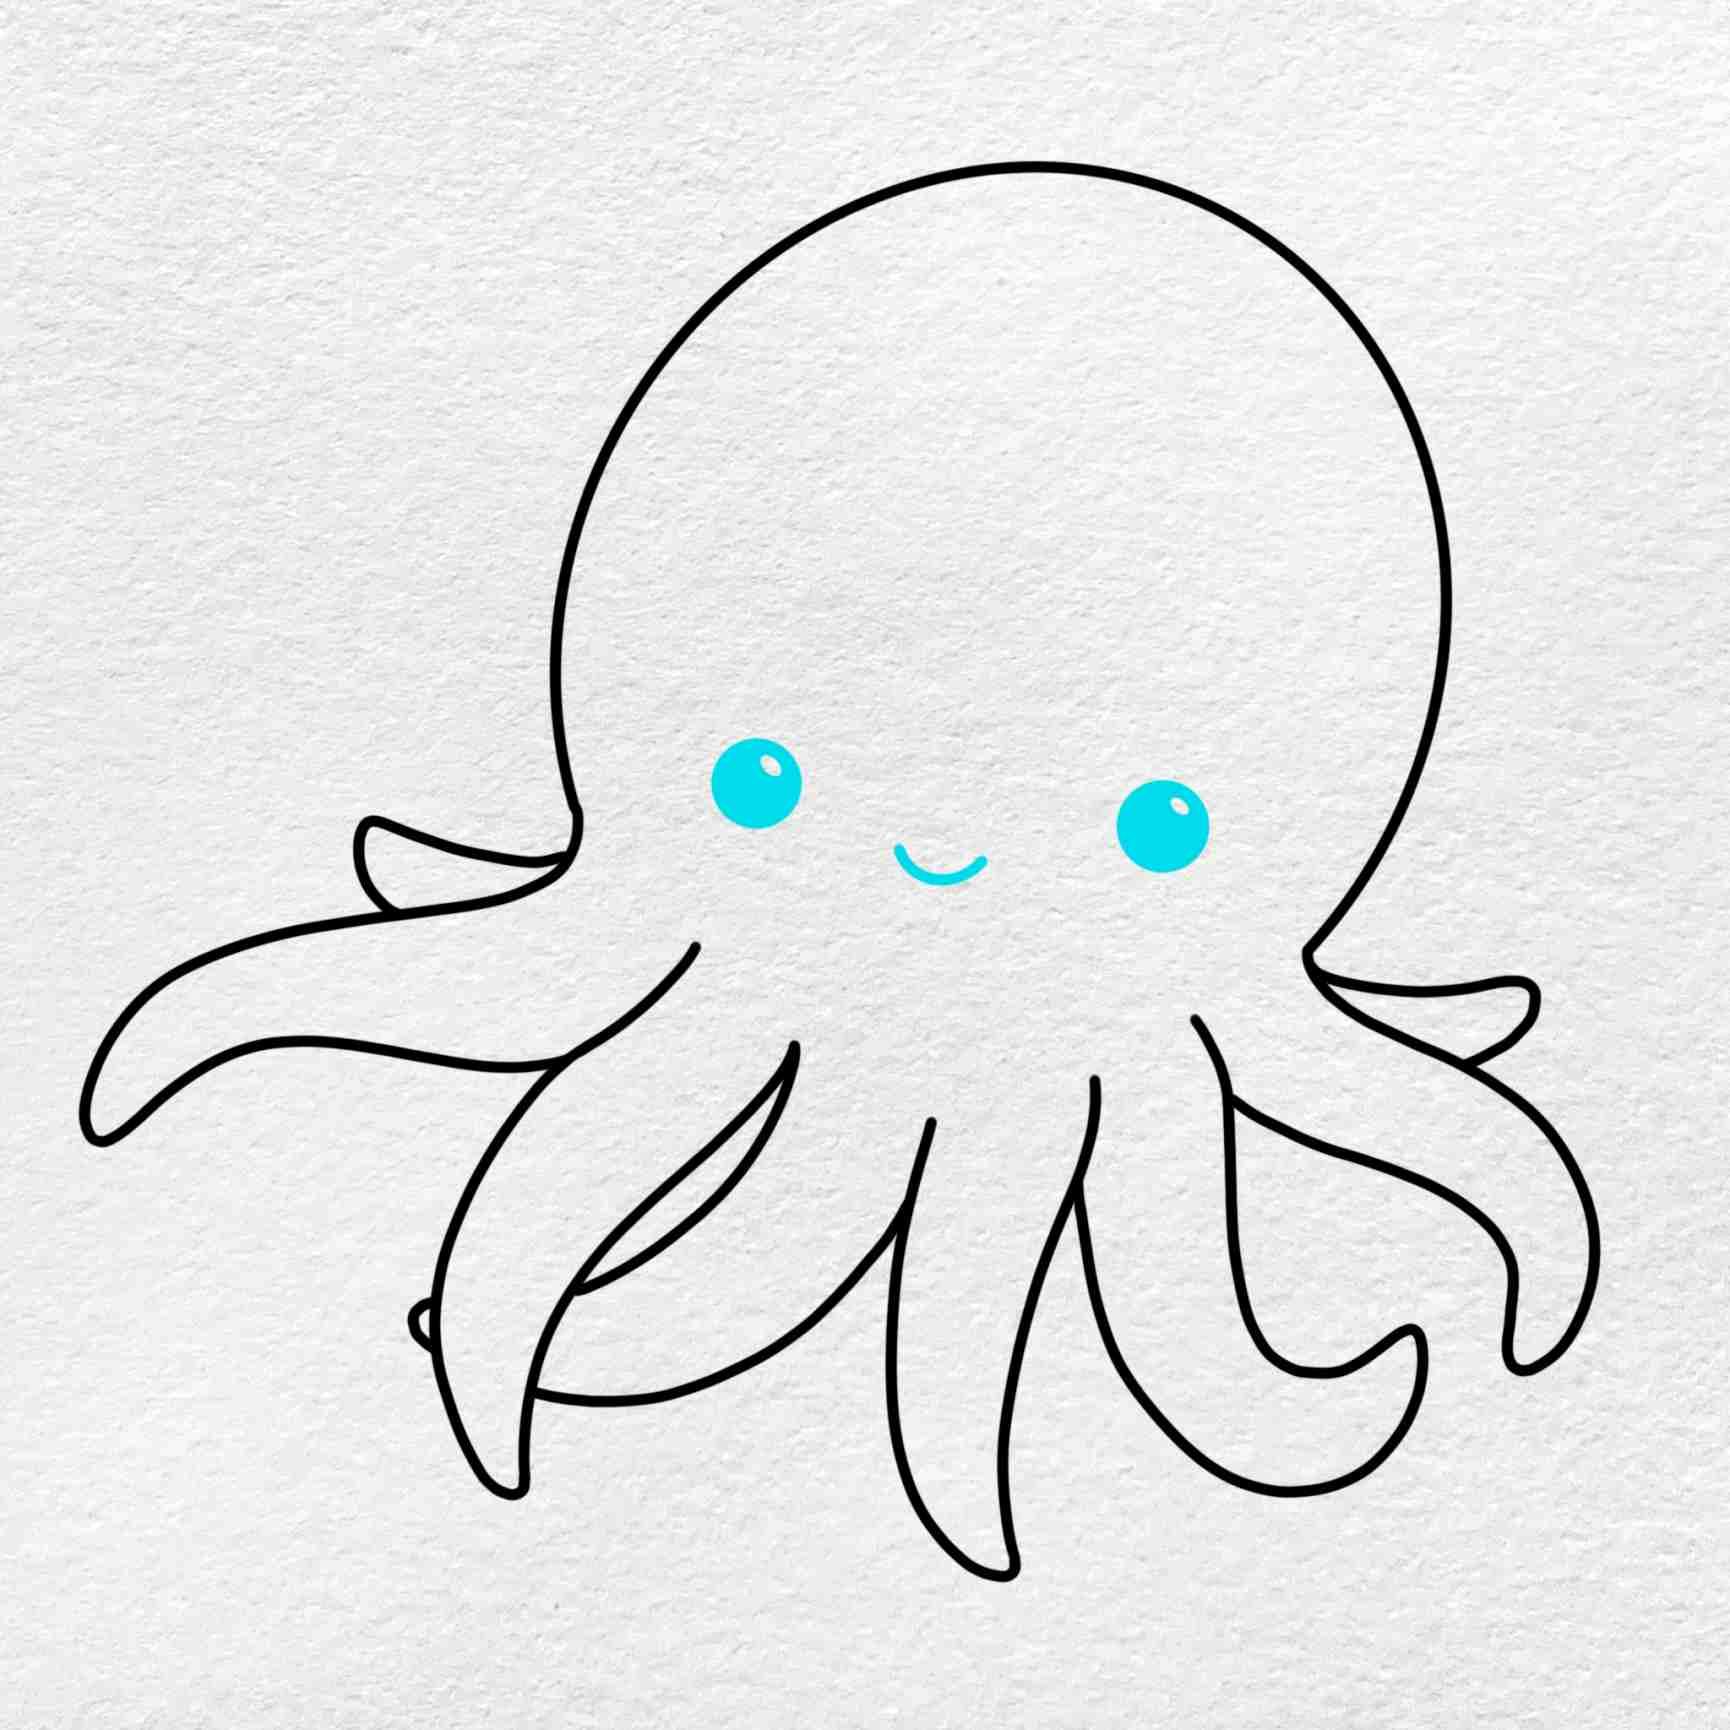 Cute Octopus Drawing: Step 5